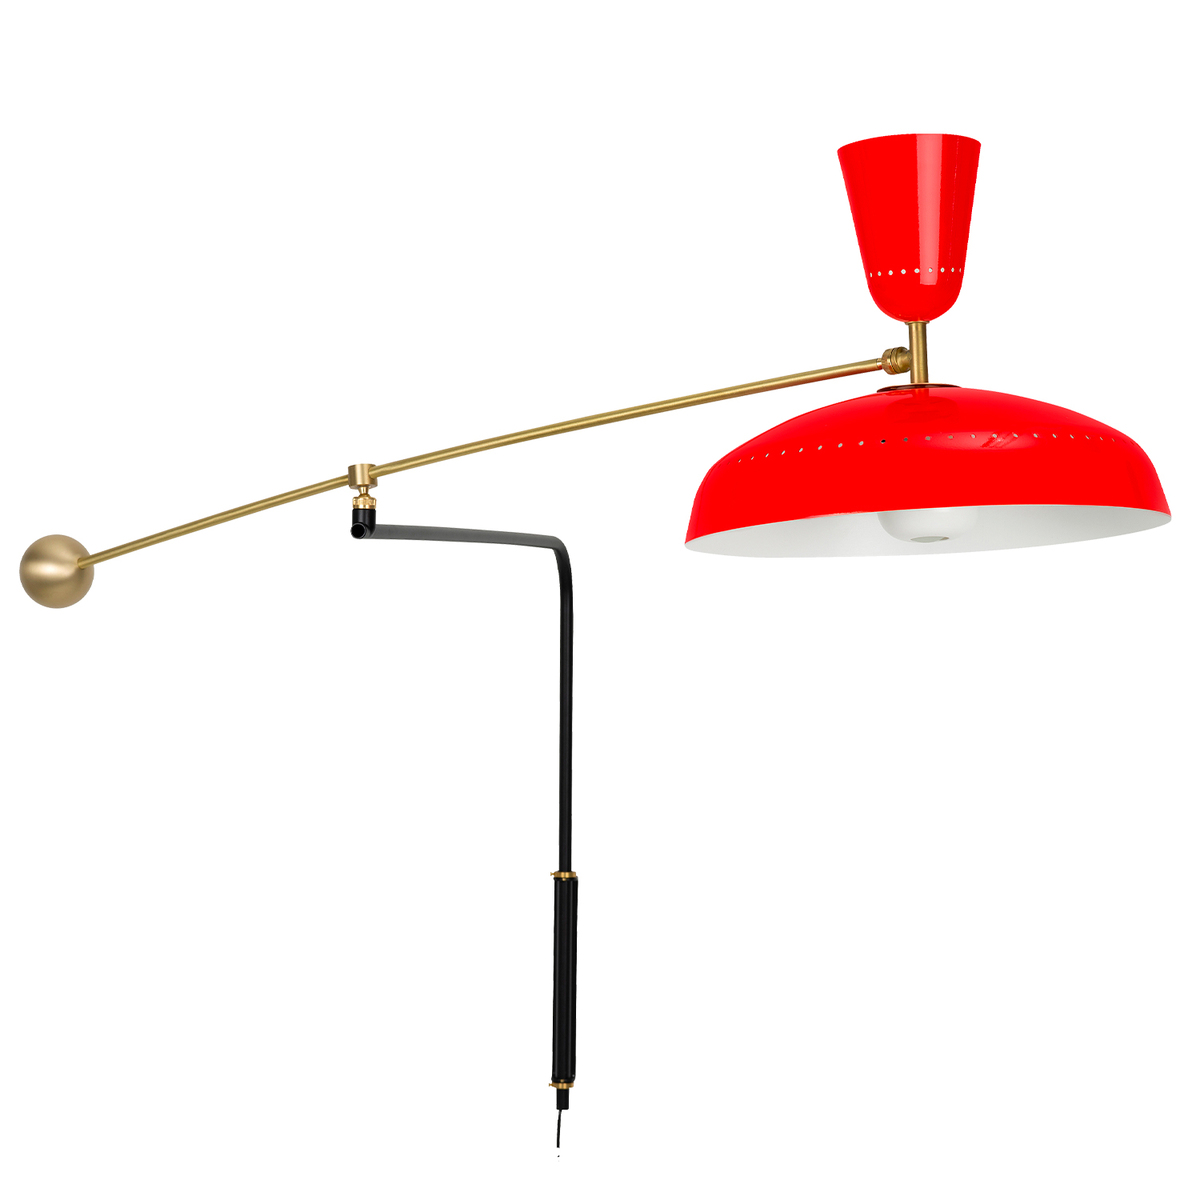 Sammode G1 Wall Lamp, Vermilion Red